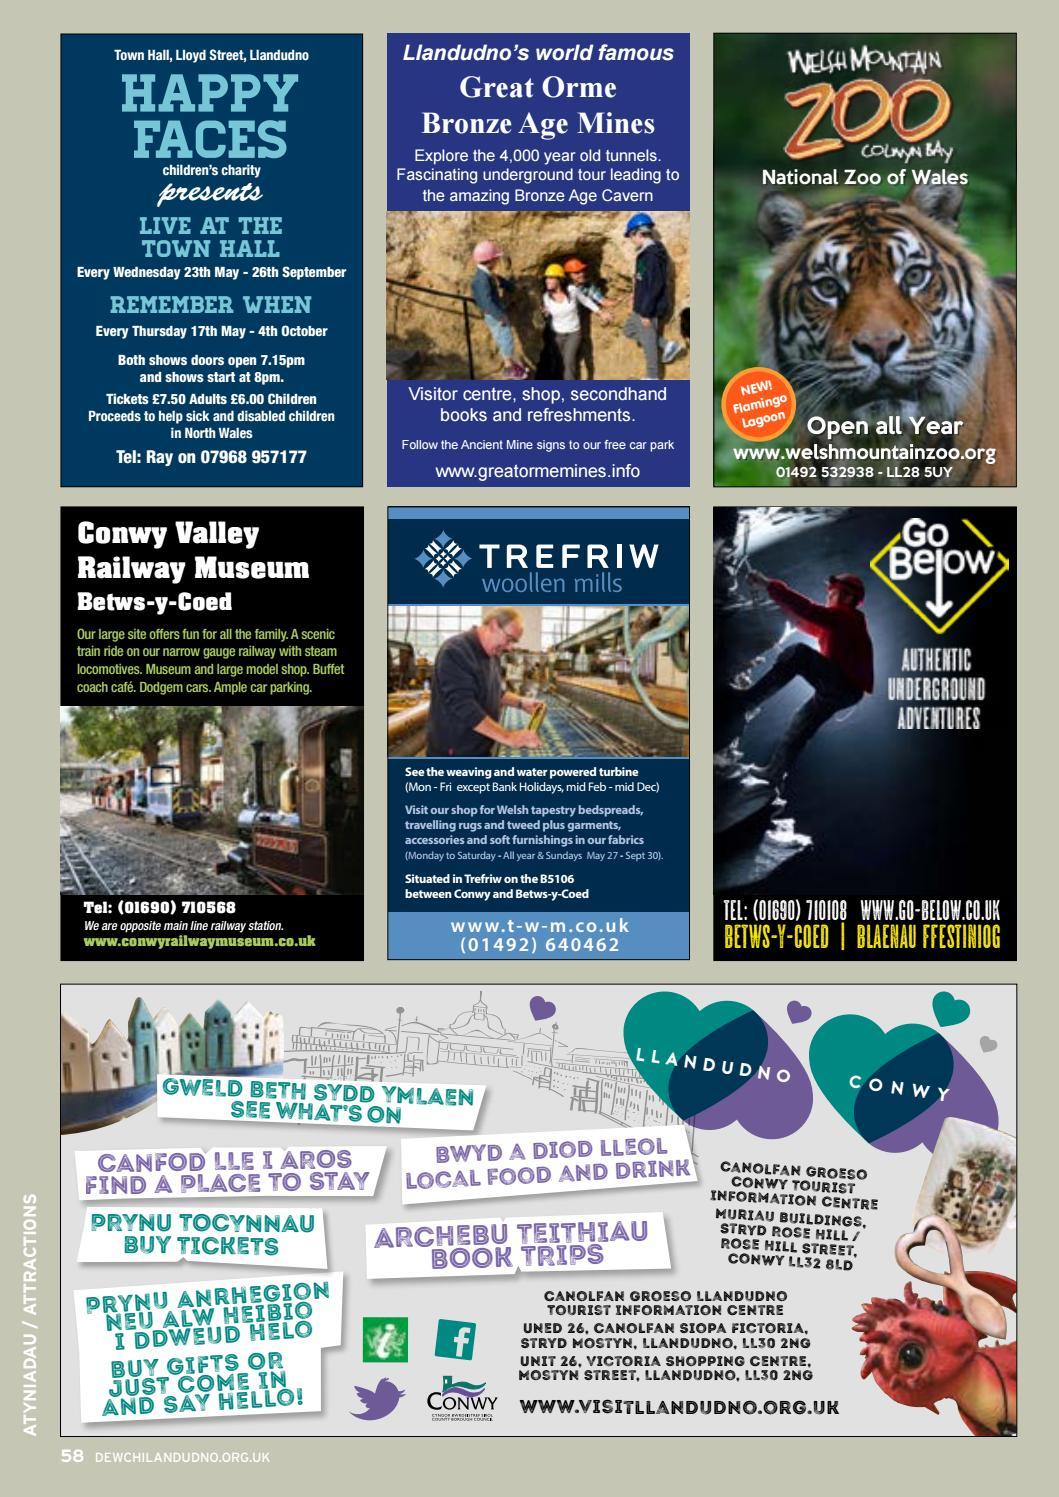 Llandudno Tourism Brochure 2018 #MAKINGMEMORIES by